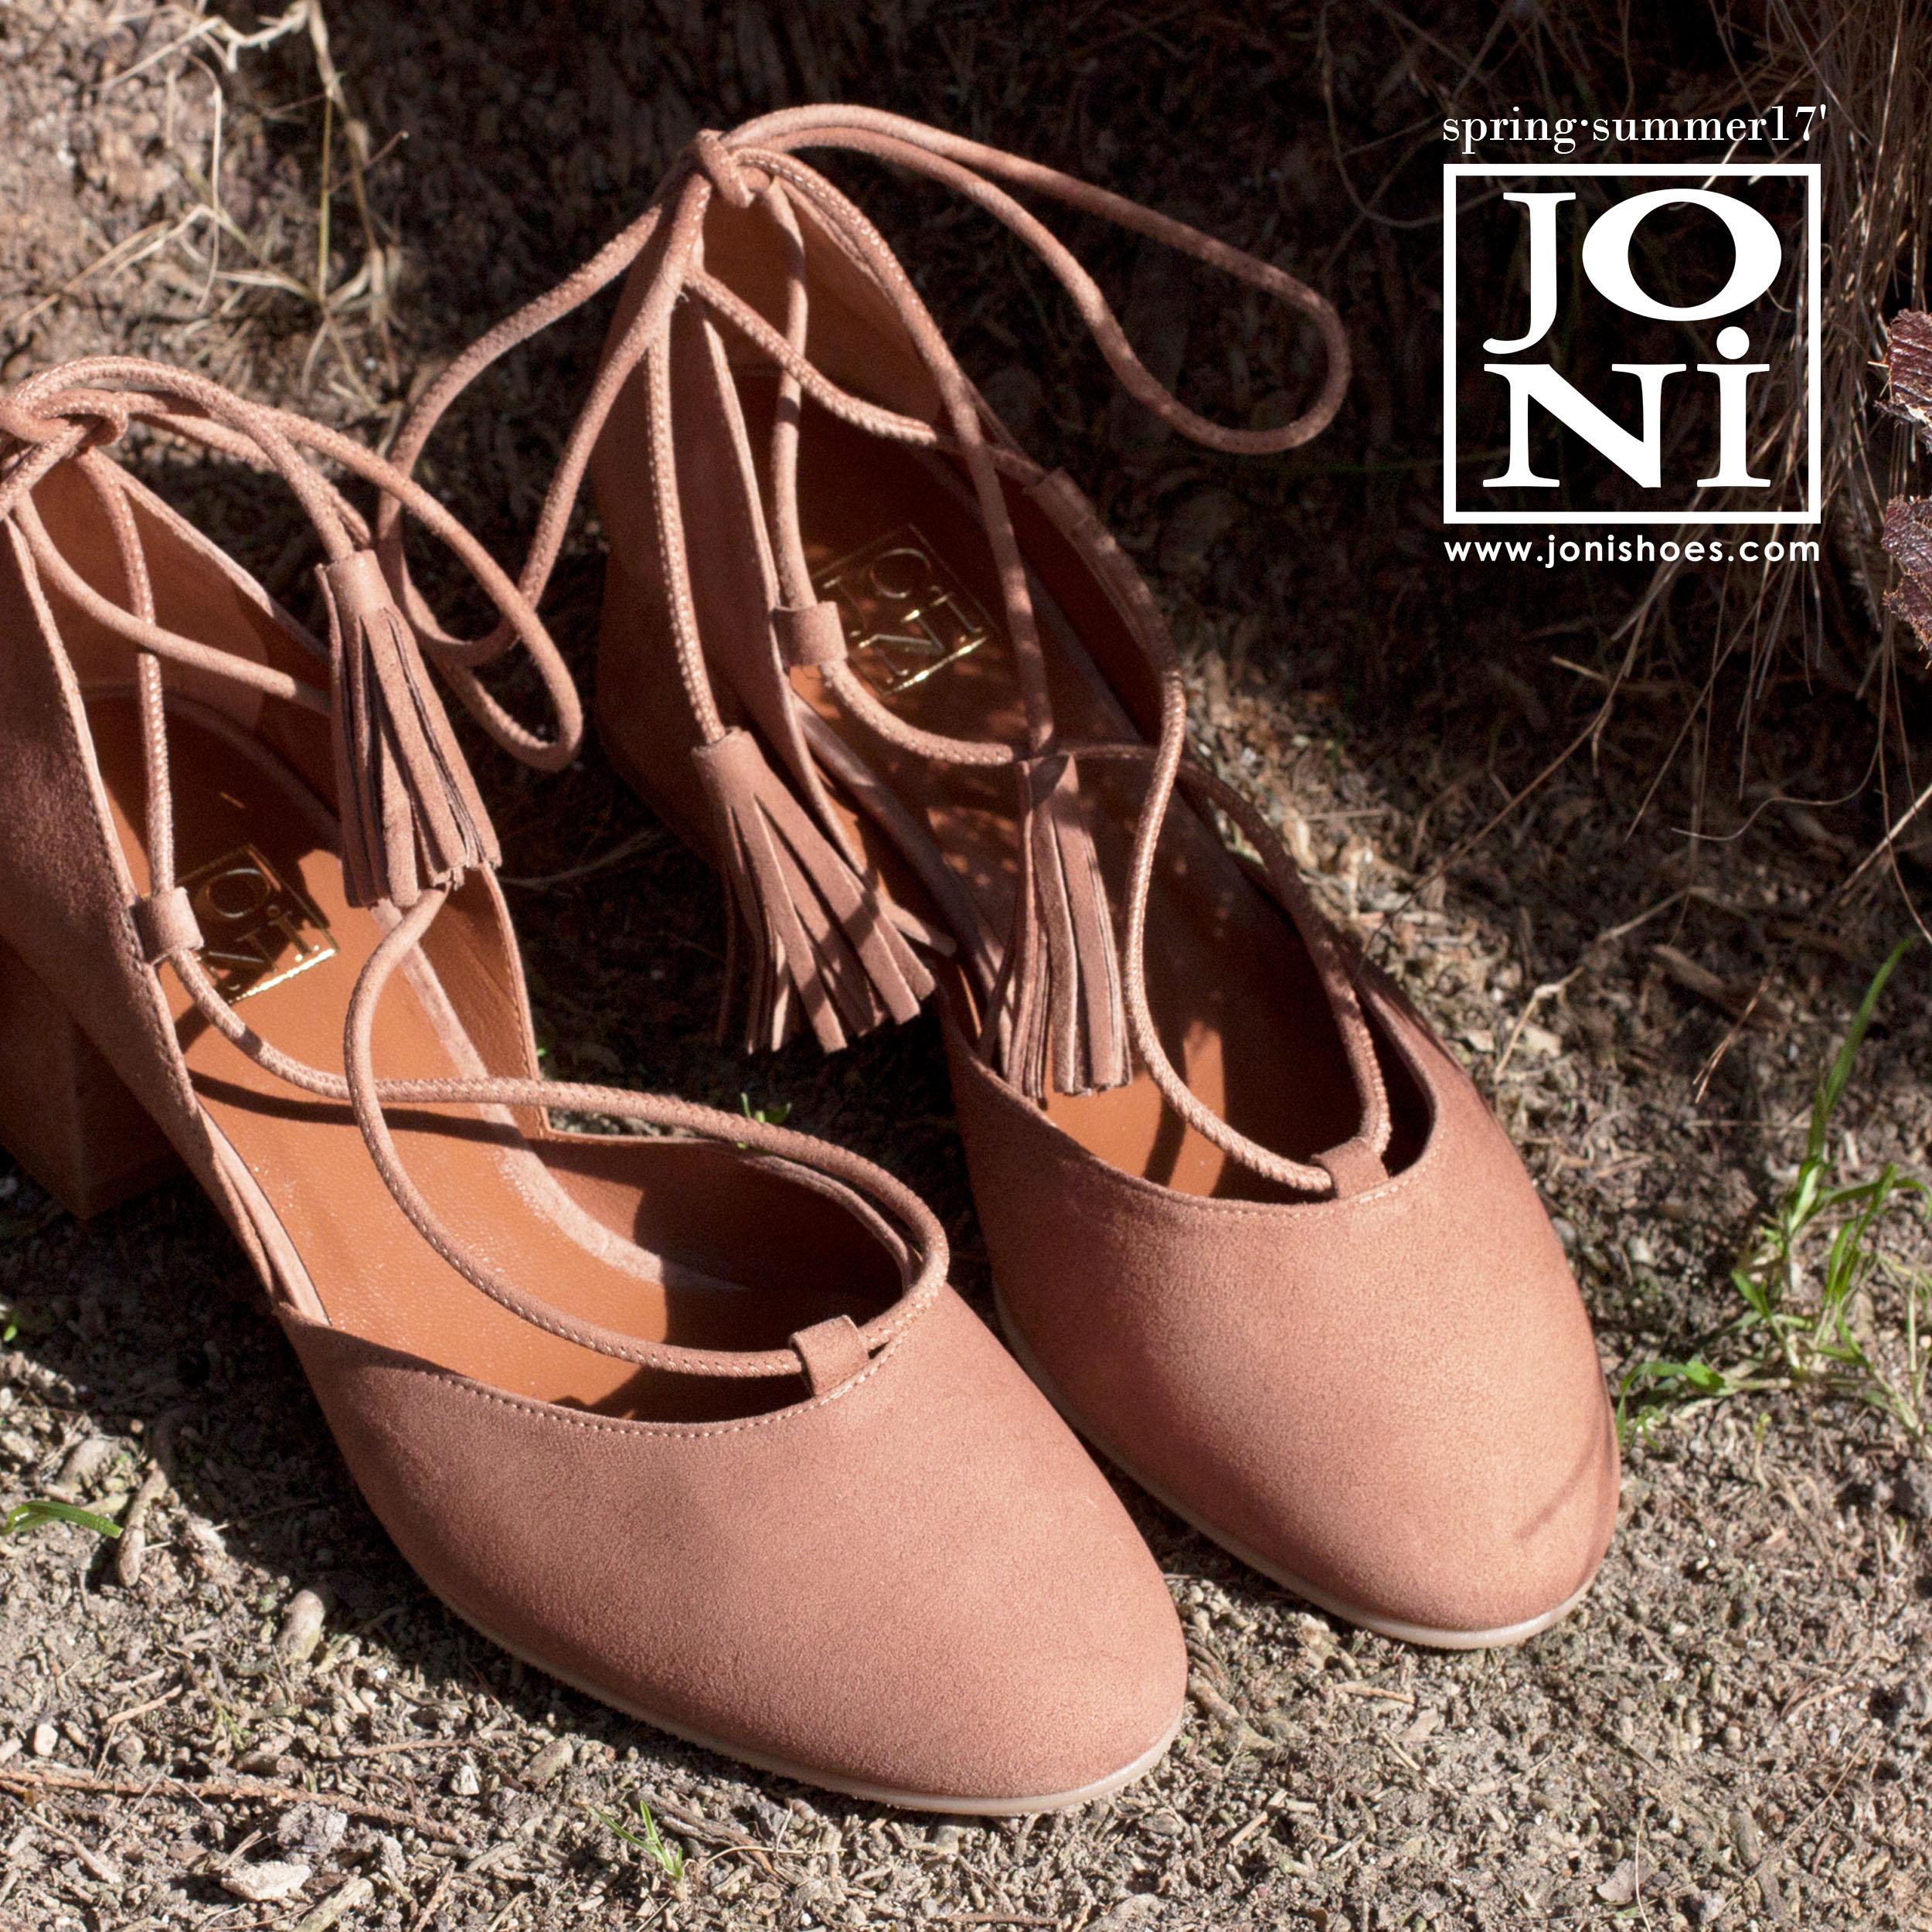 Multitiras JoniSandalias Tendencia Ss17 ArenaJoni Shoes yOm8Nv0Pnw